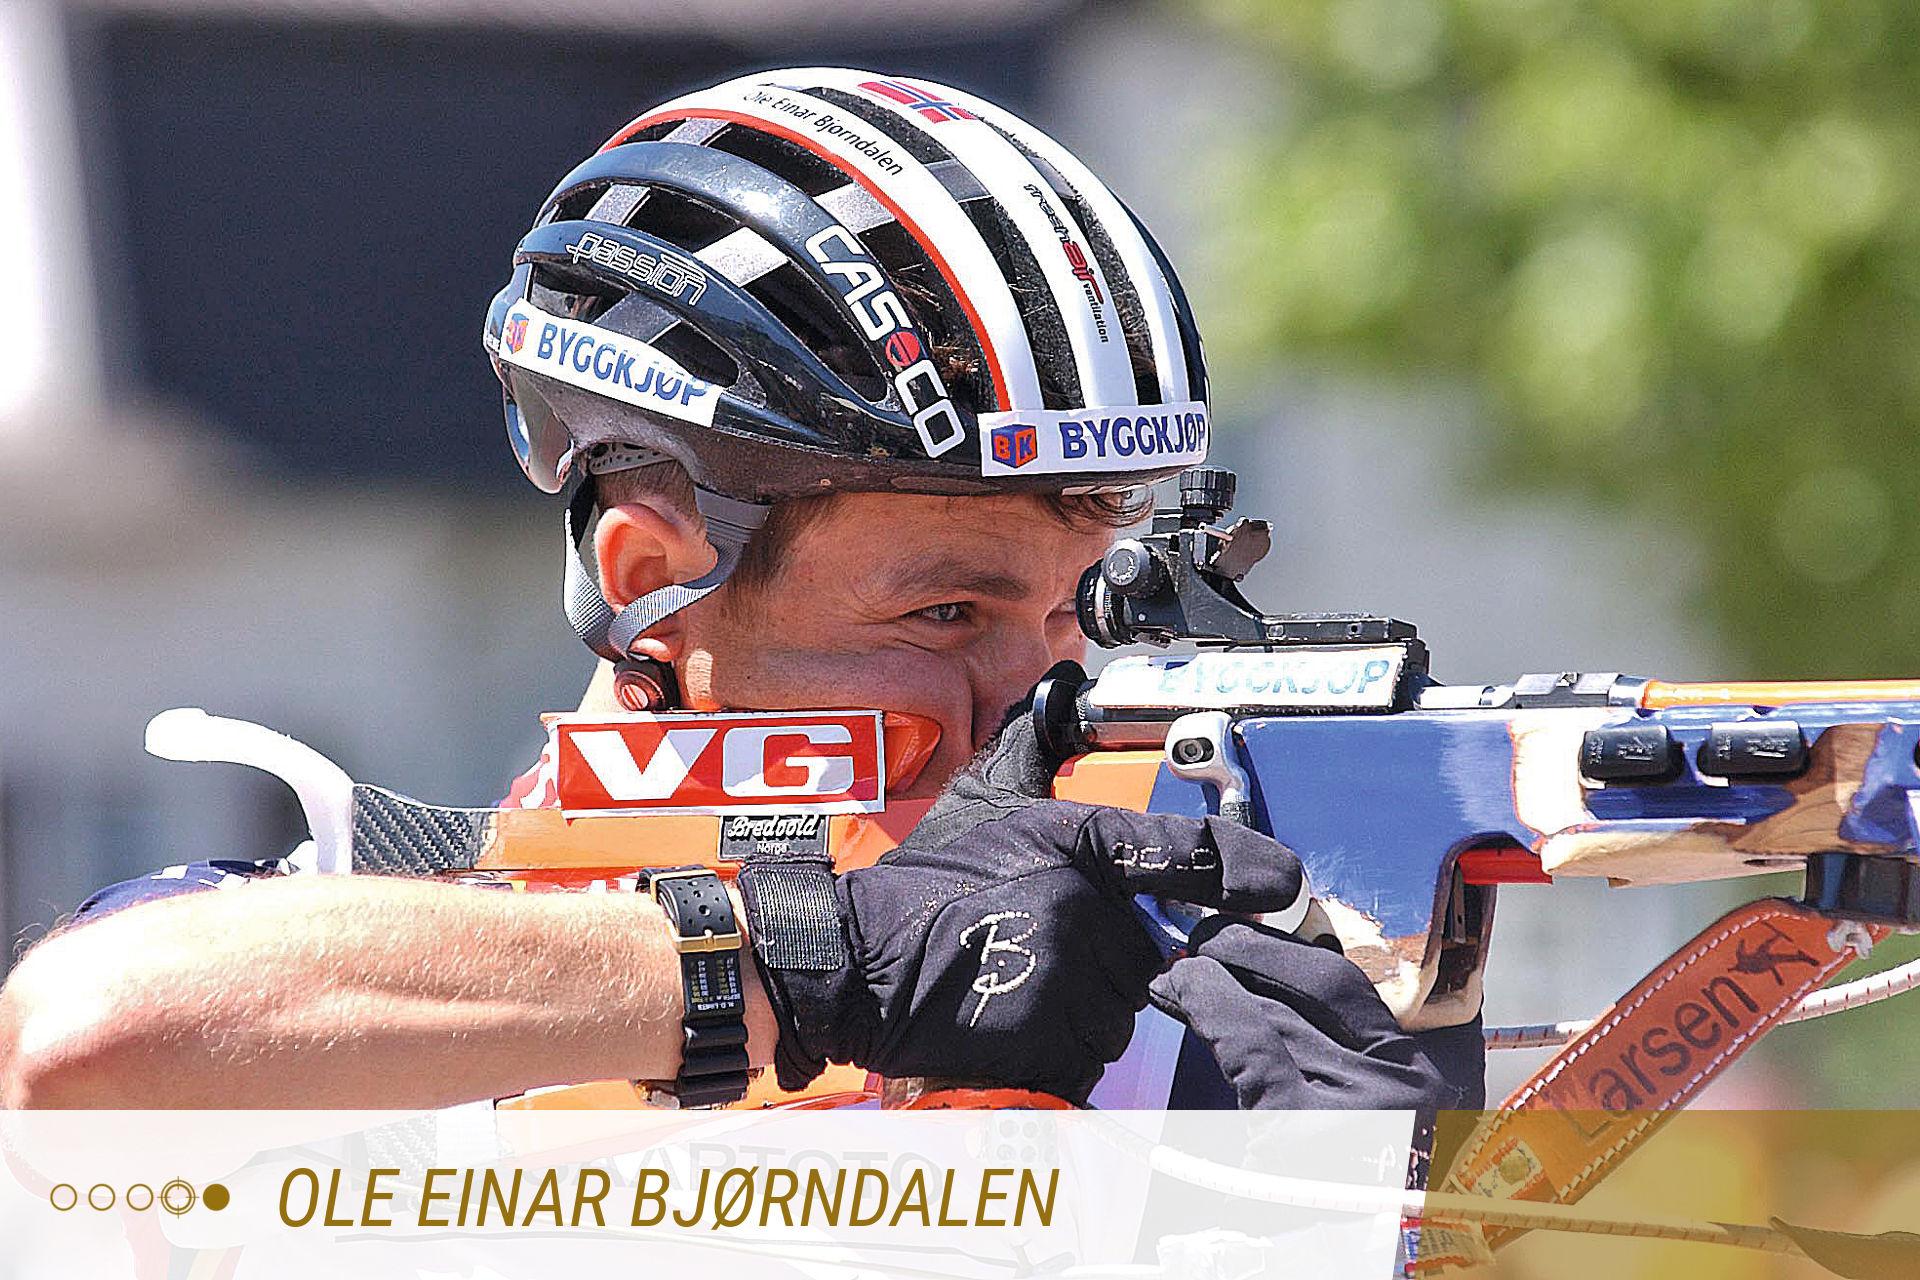 Athleten_Historie_OleEinarBjorndalen